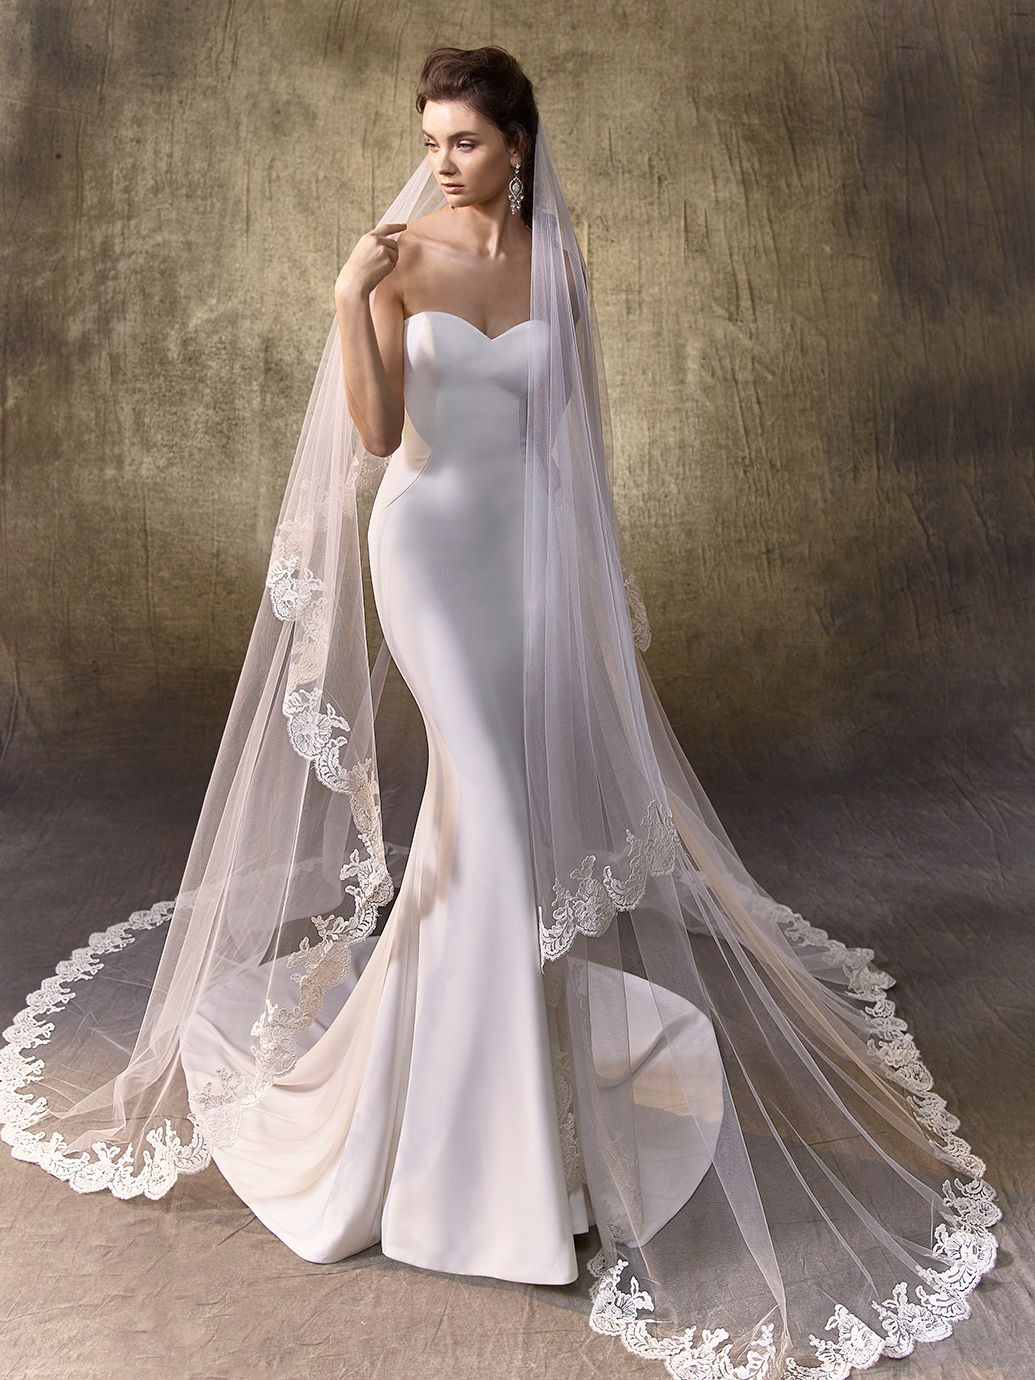 simple minimalist plain white dress wedding gown 2017